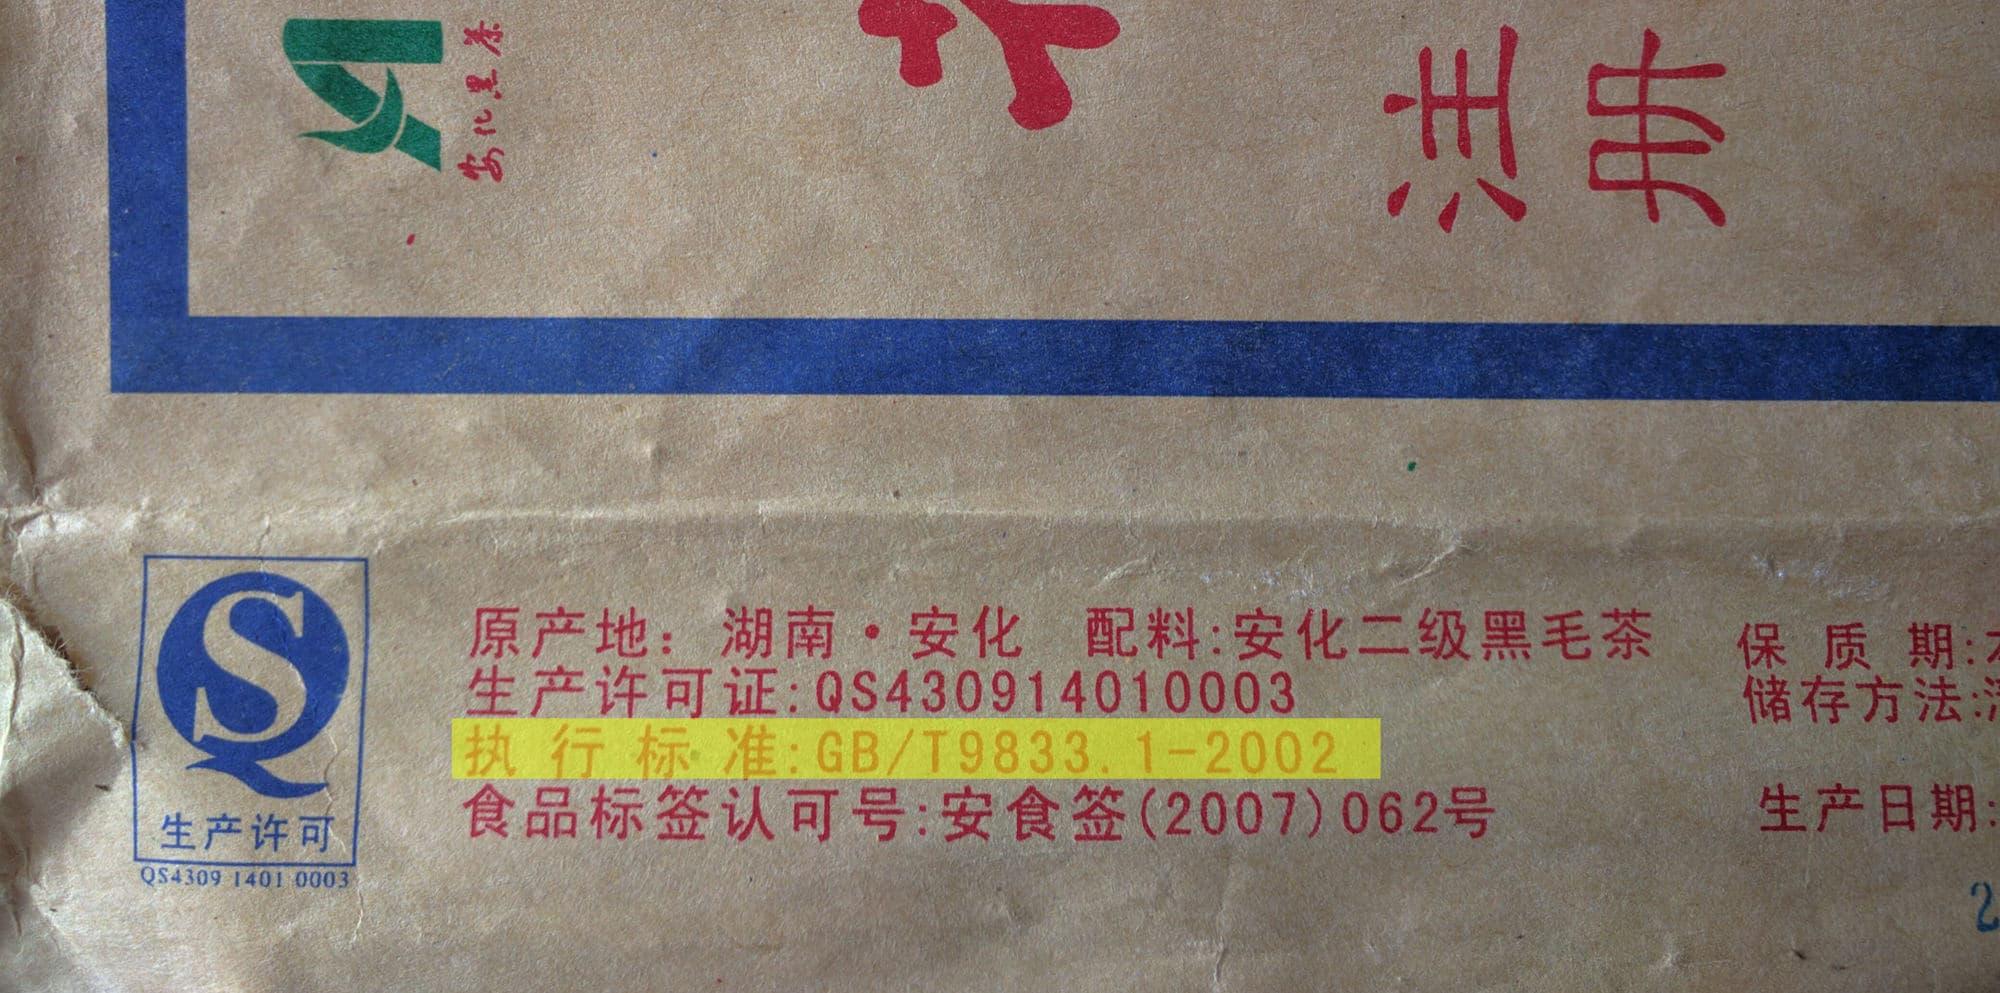 hua-zhaun-heicha-label